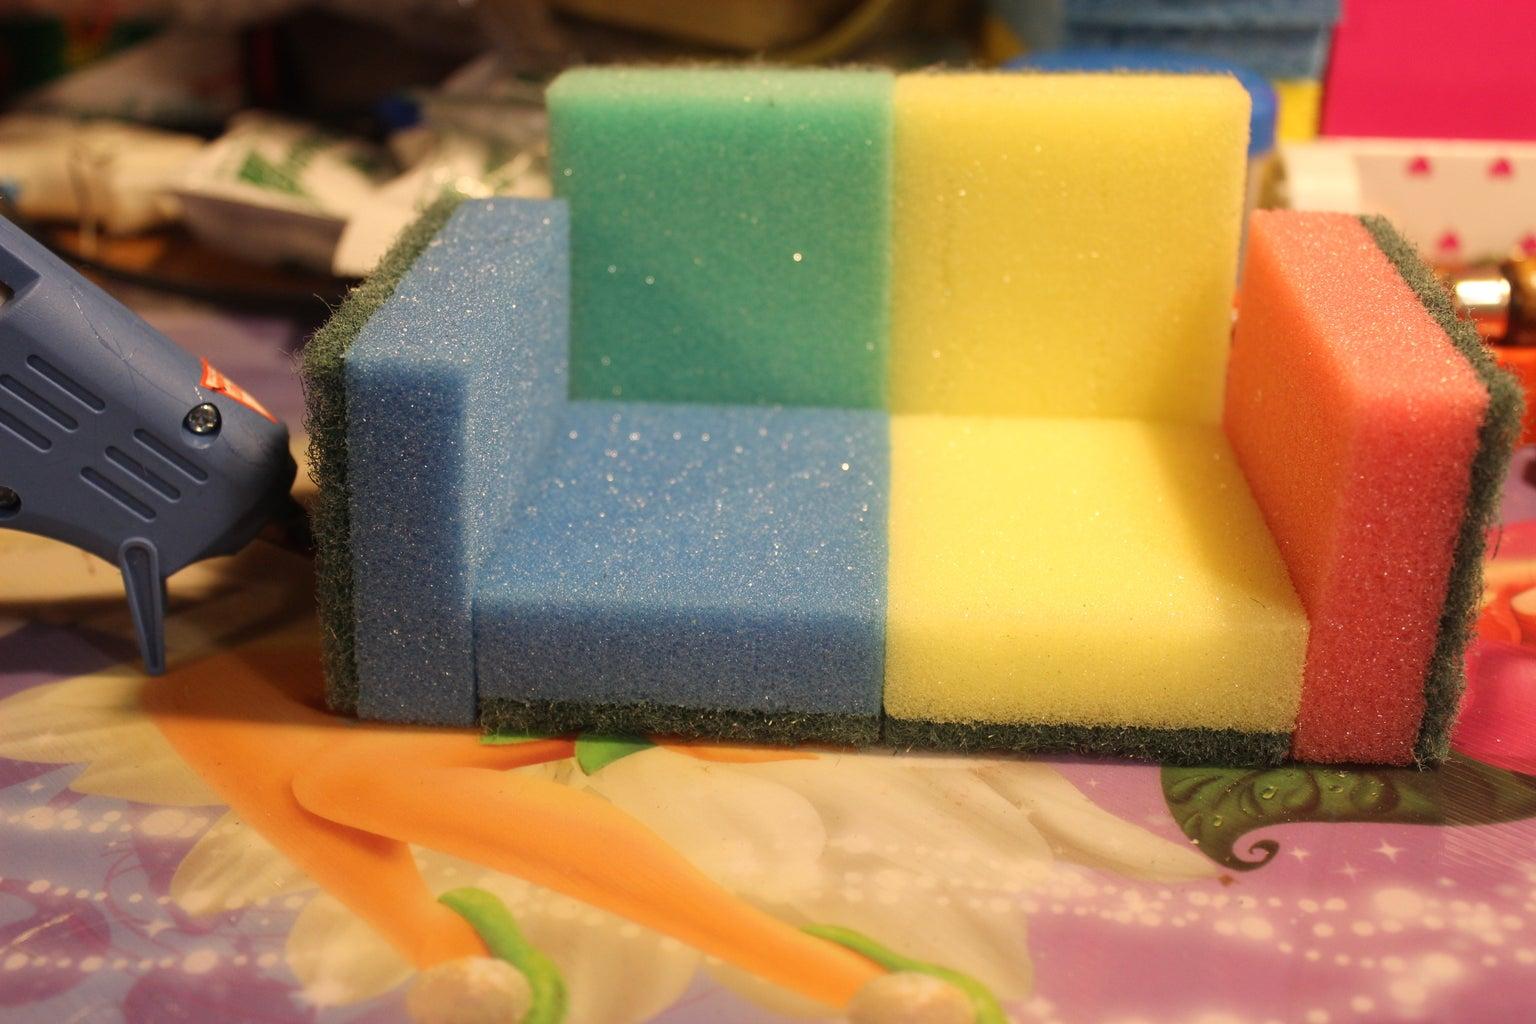 Glue the Sponges